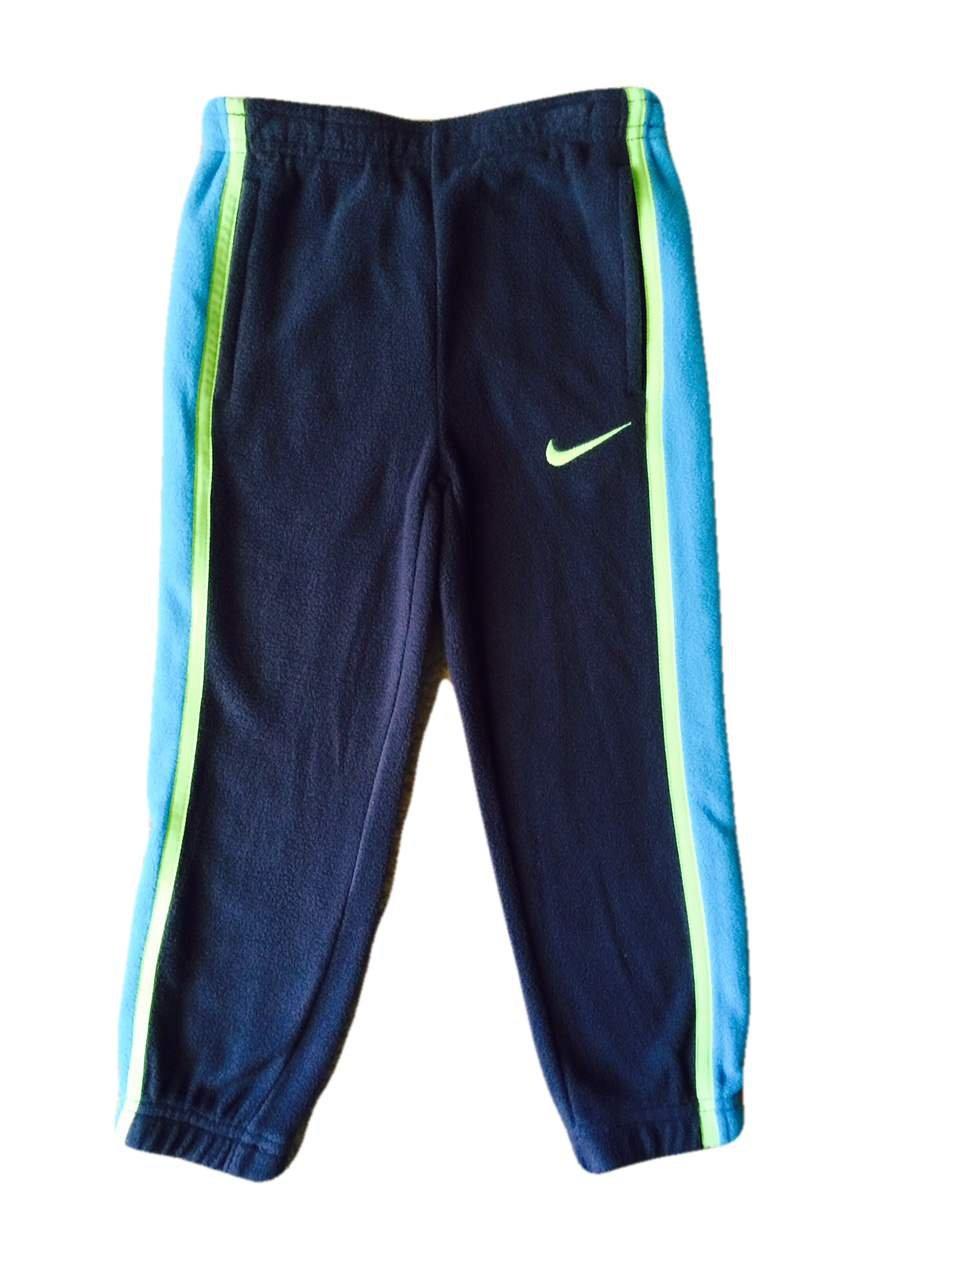 0a9c55dc8ff7 Amazon.com  Nike Boys Sweat Pants Fleece - Grey Turquoise Yellow - 3T   Sports   Outdoors